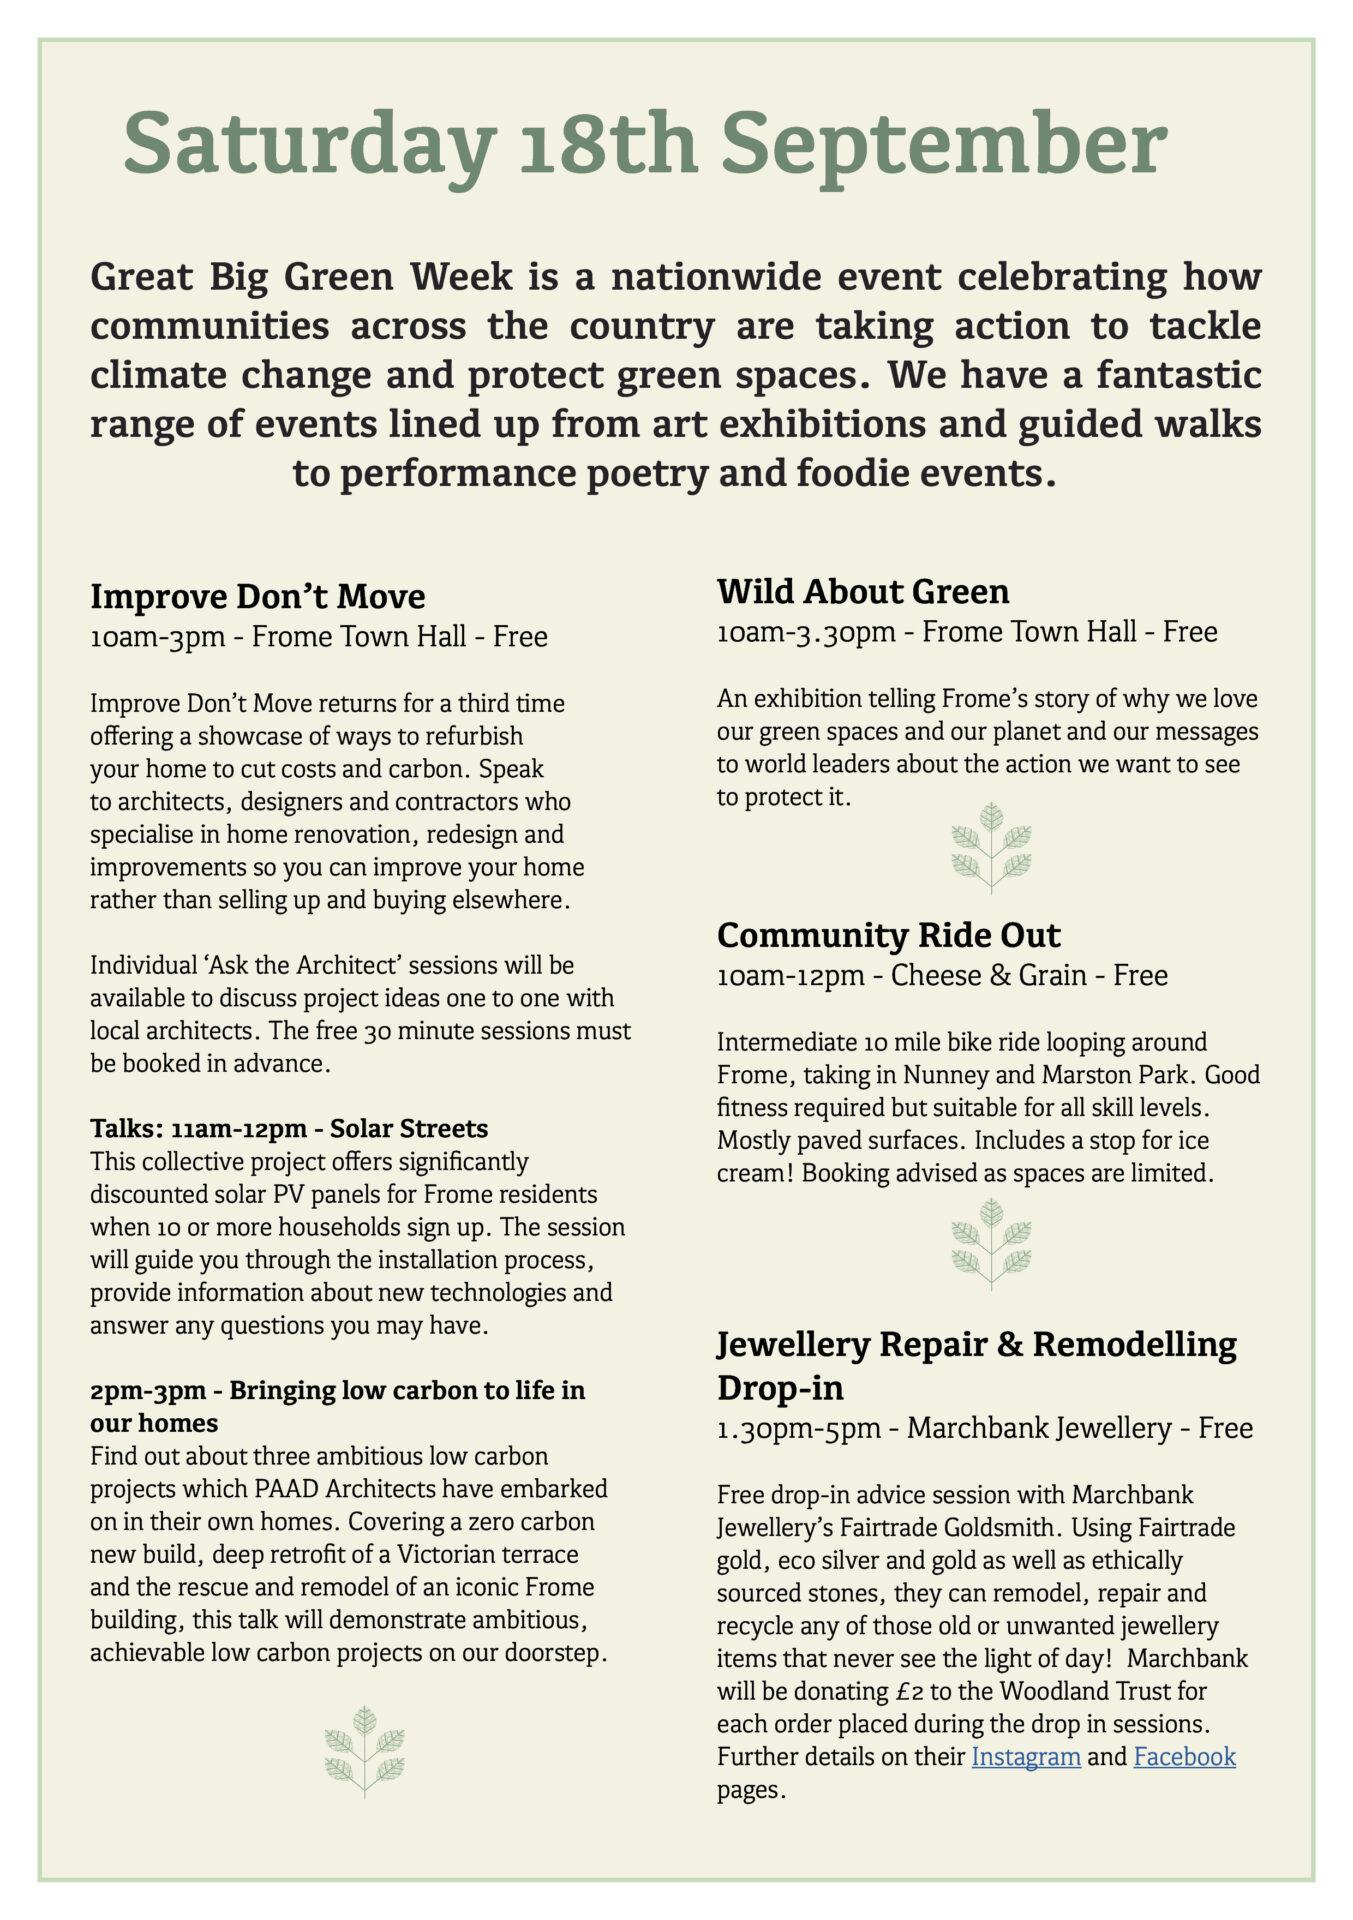 Great Big Green Week 2021 programme page 2